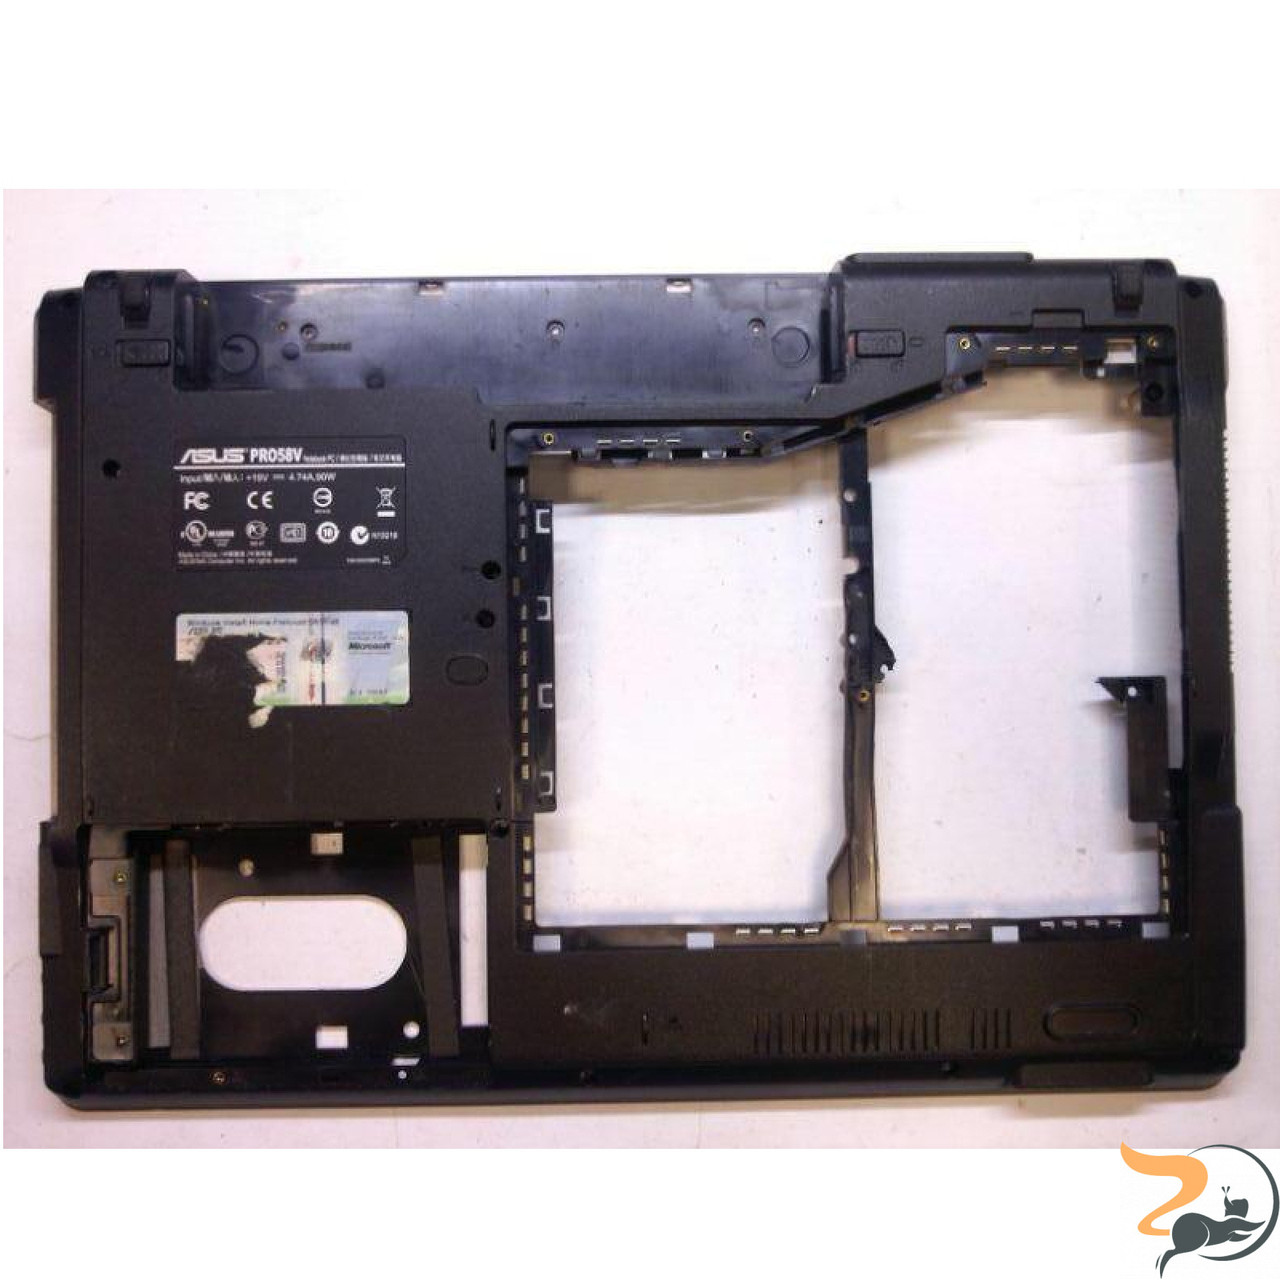 Нижня частина корпуса для ноутбука Asus PRO58V, 13GNED10P15X, Б/В